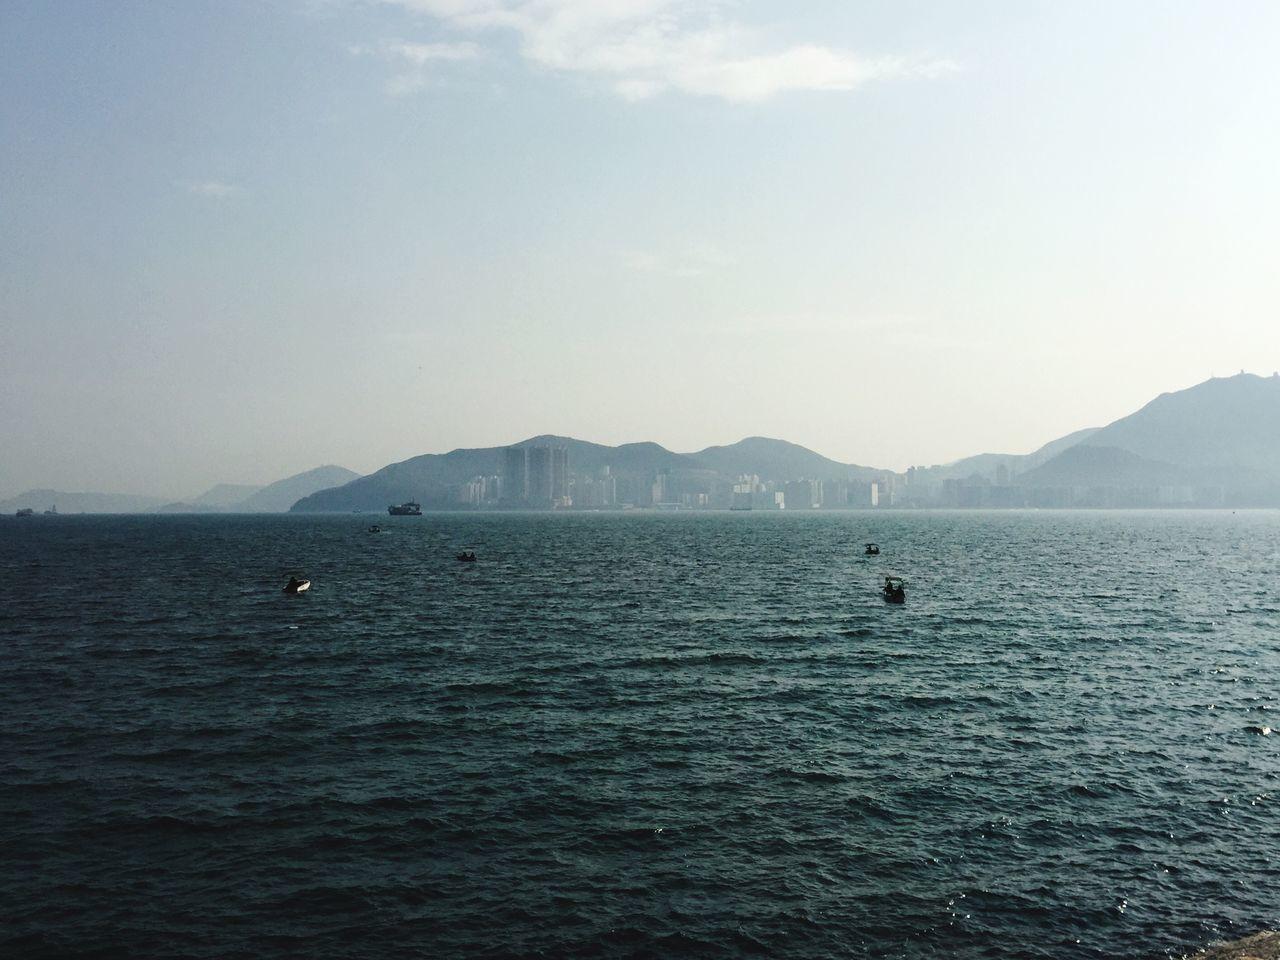 Tseung Kwan O Seaview Serenity Skyline Clear Sky Nobody Moody Sky IPhoneography Hong Kong Sunday EyeEm Nature Lover The Tourist Boat